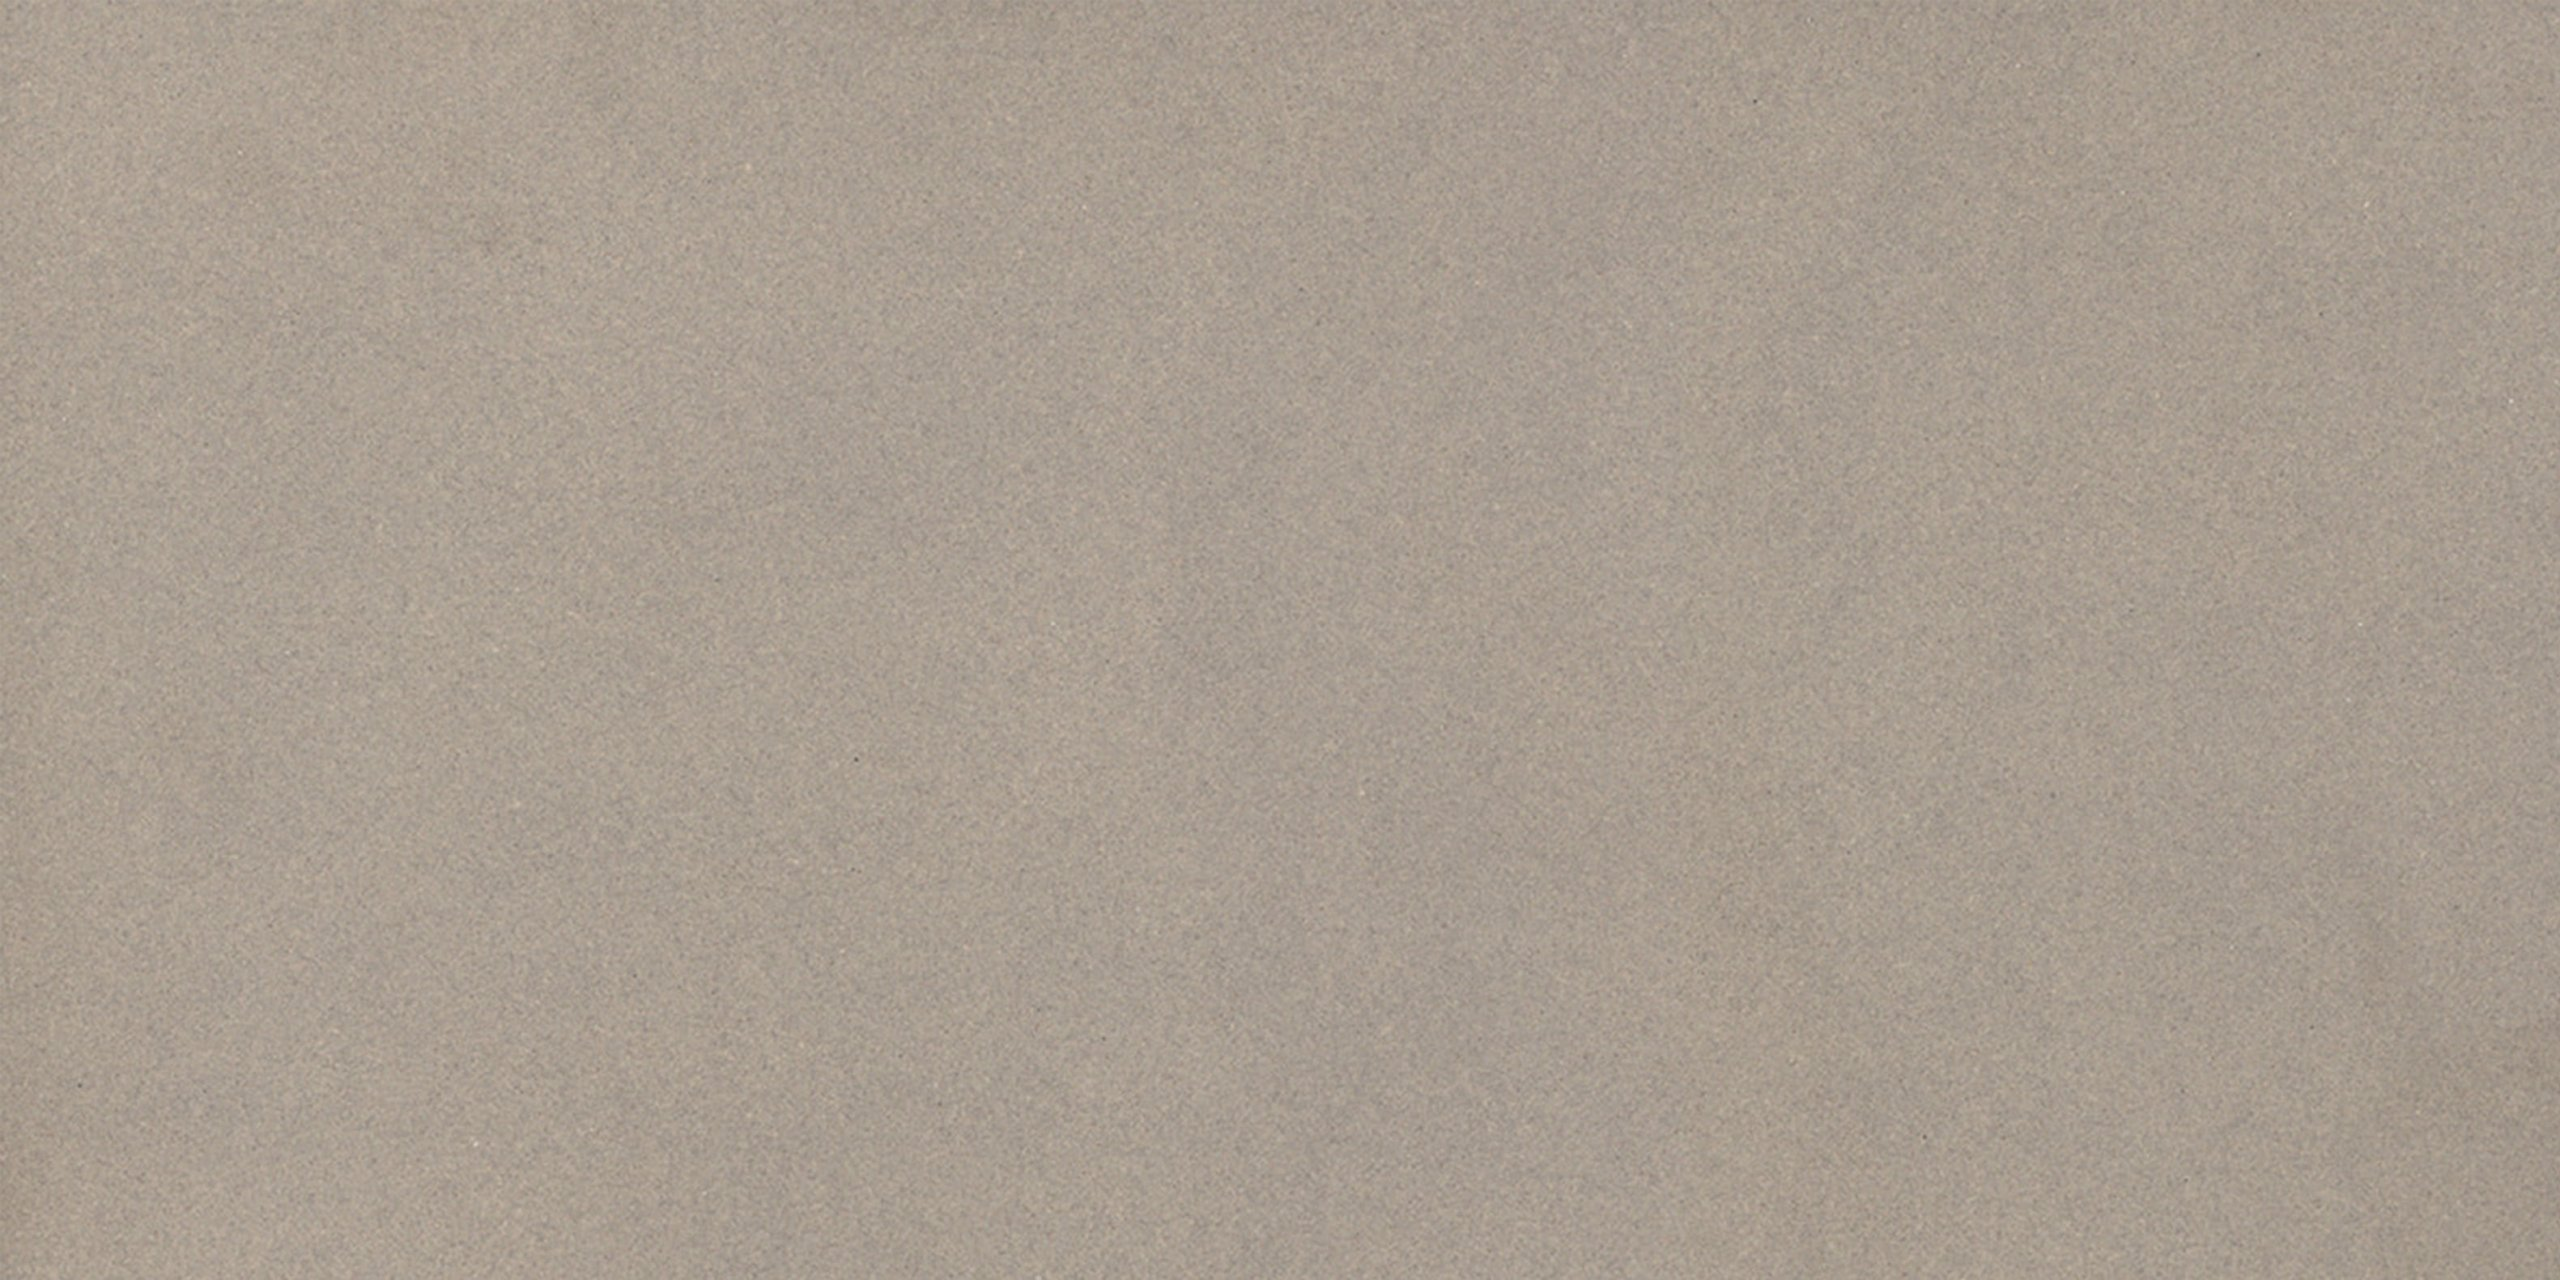 Fiandre USA USH1224054 Contemporary 12'' x 24'' New Marmi Taupe Gray Honed Porcelain Tile (8 Pack), Beige